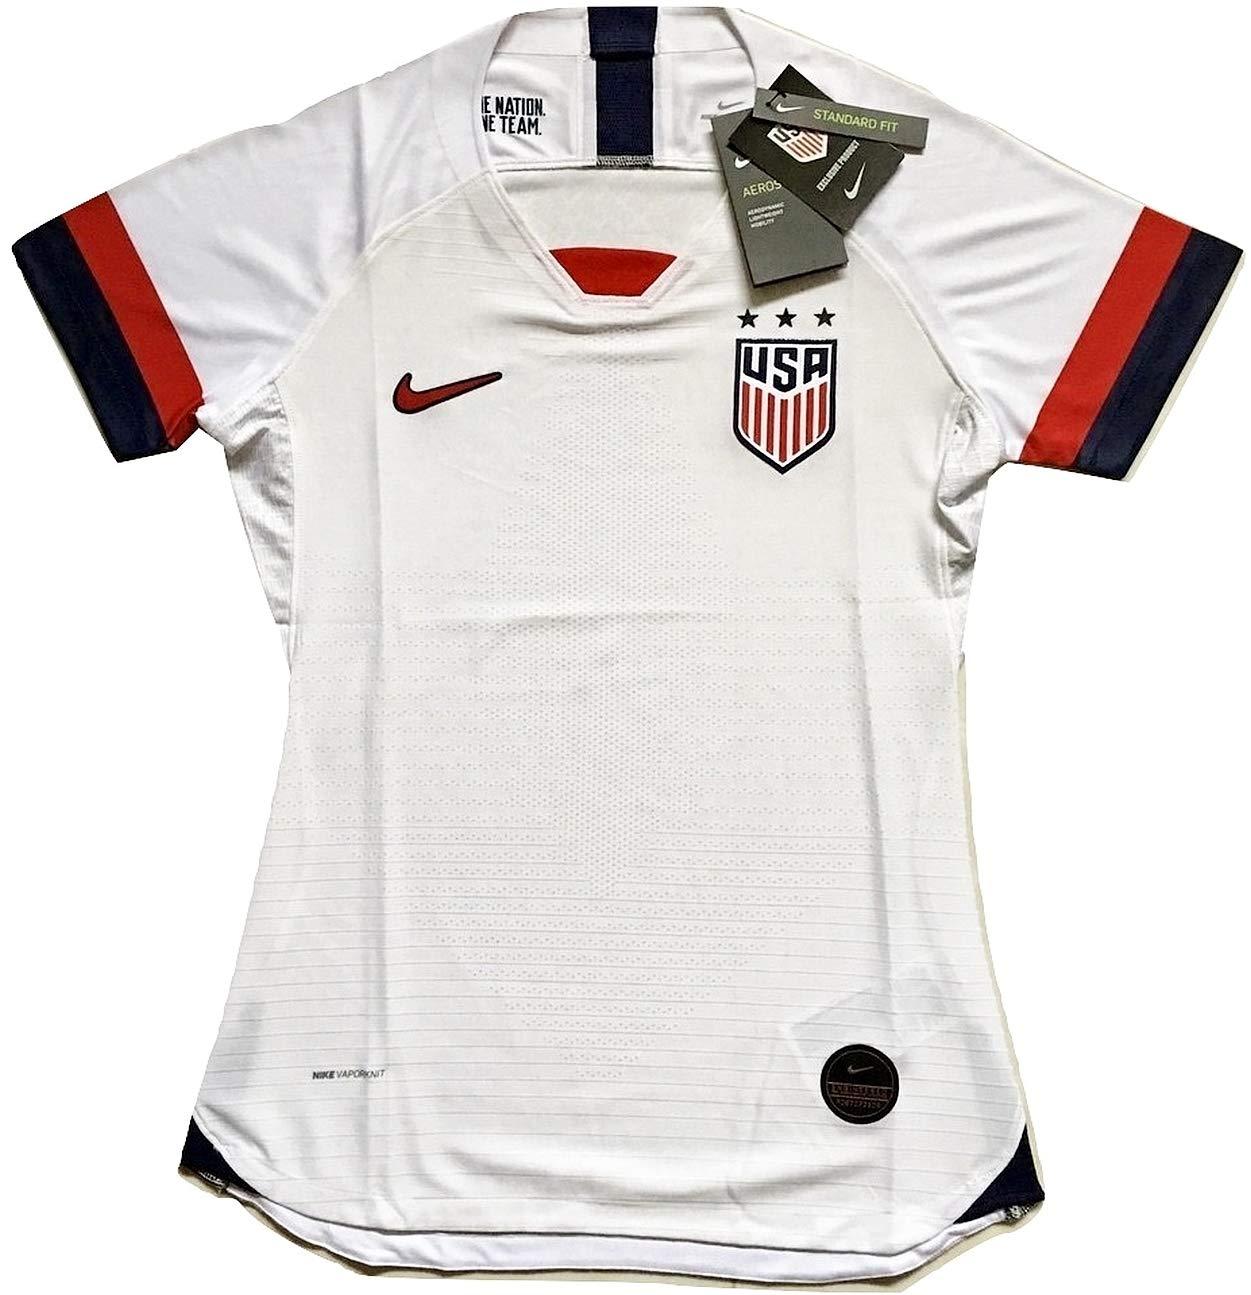 Enevva Women's USA National Team 2019-2020 Home Authentic Vapor Match Soccer Jersey White (Women's Medium)